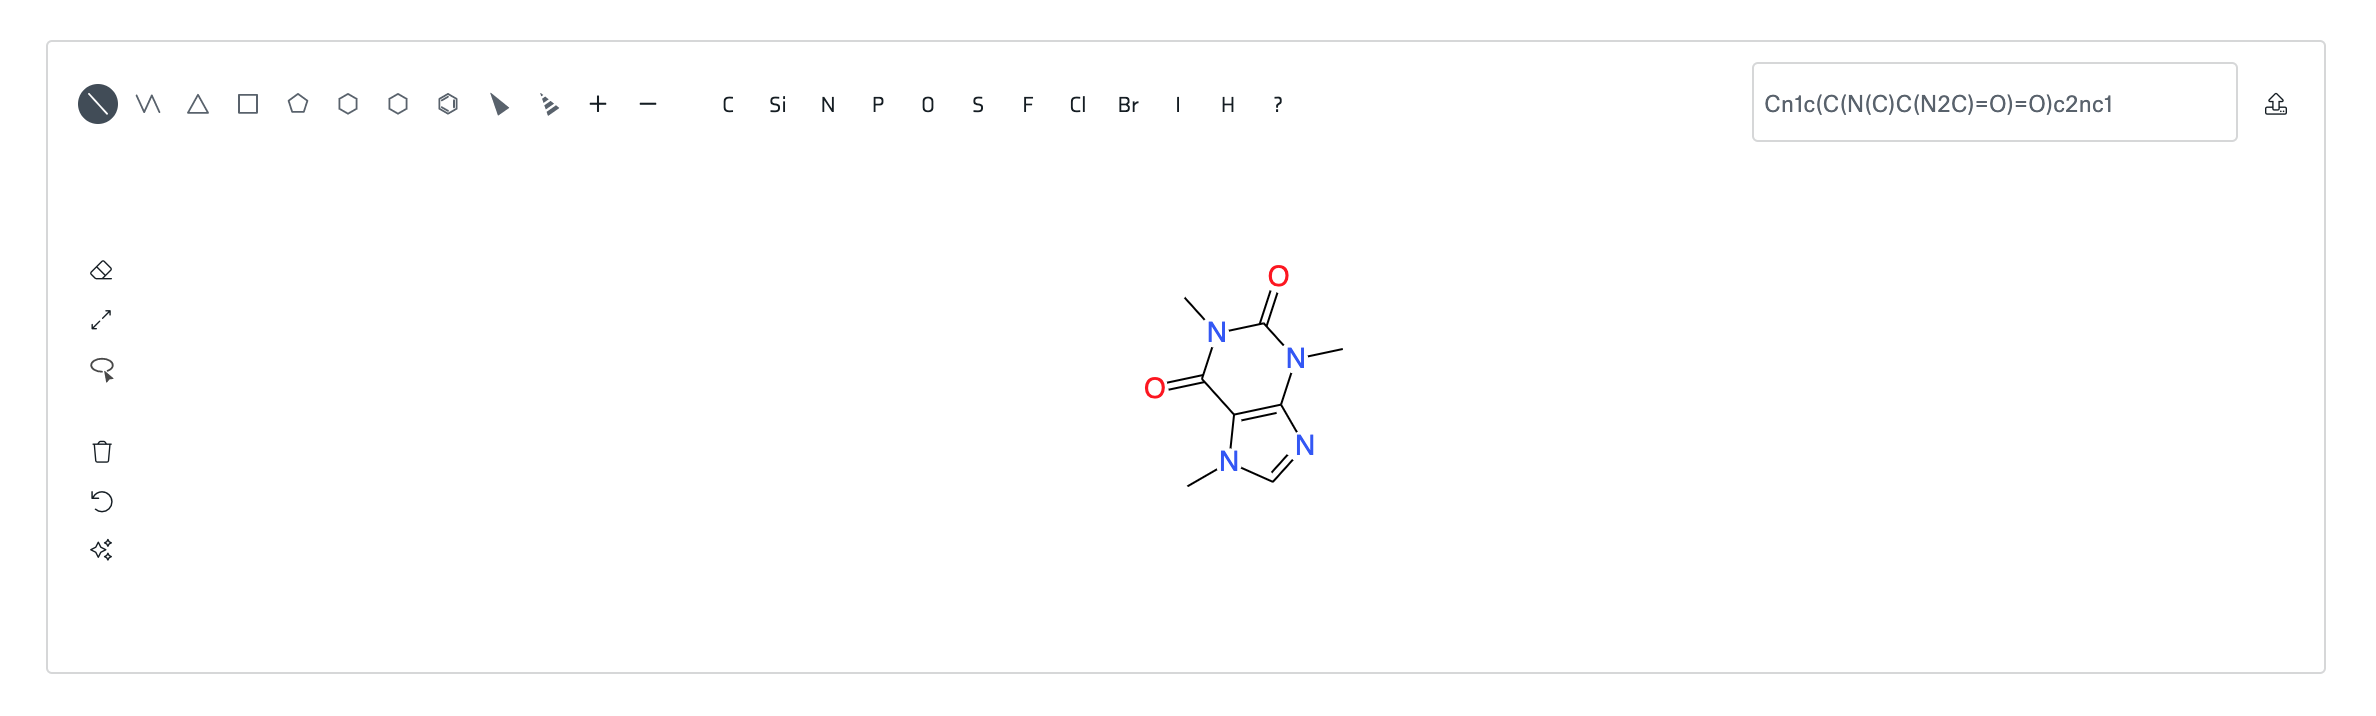 Strateos Molecule Sketching Tool